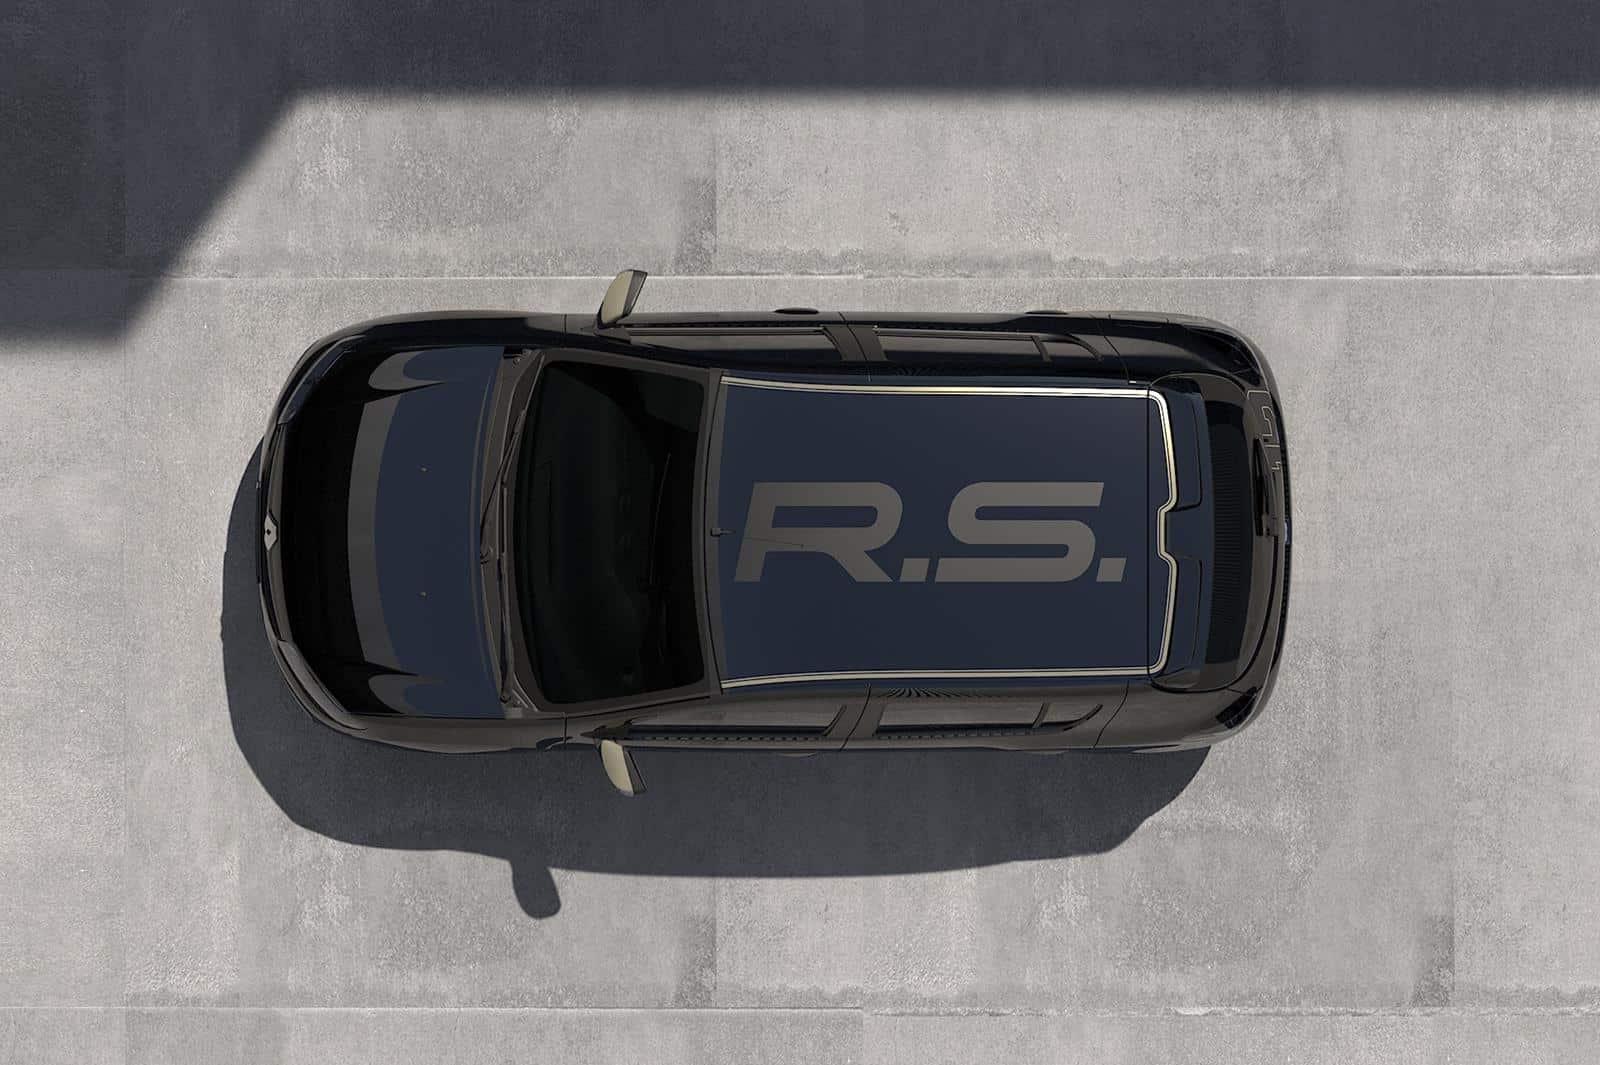 2016-renault-sandero-rs-grand-prix-concept-3